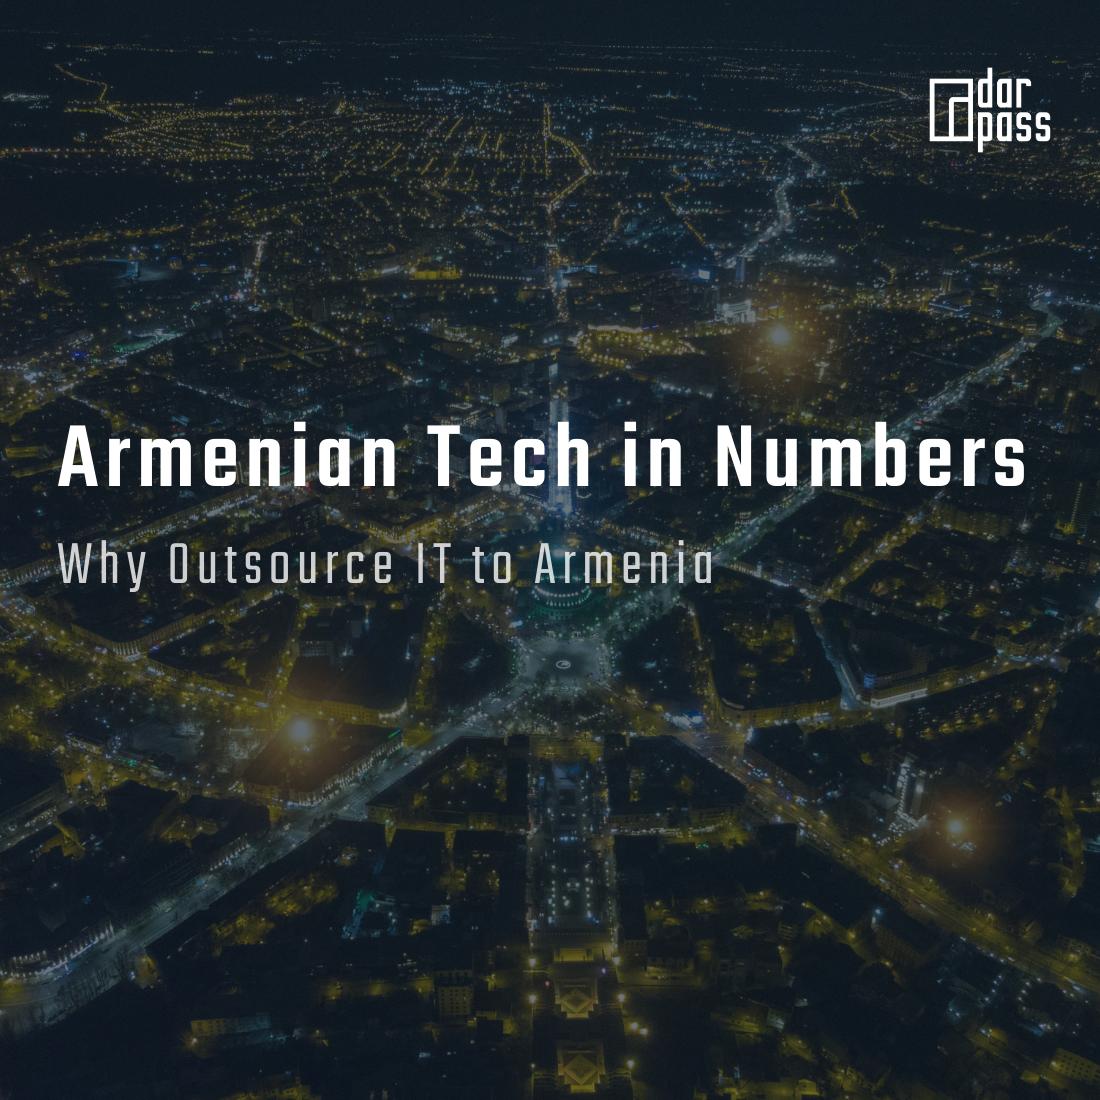 Armenian tech in numbers_Darpass